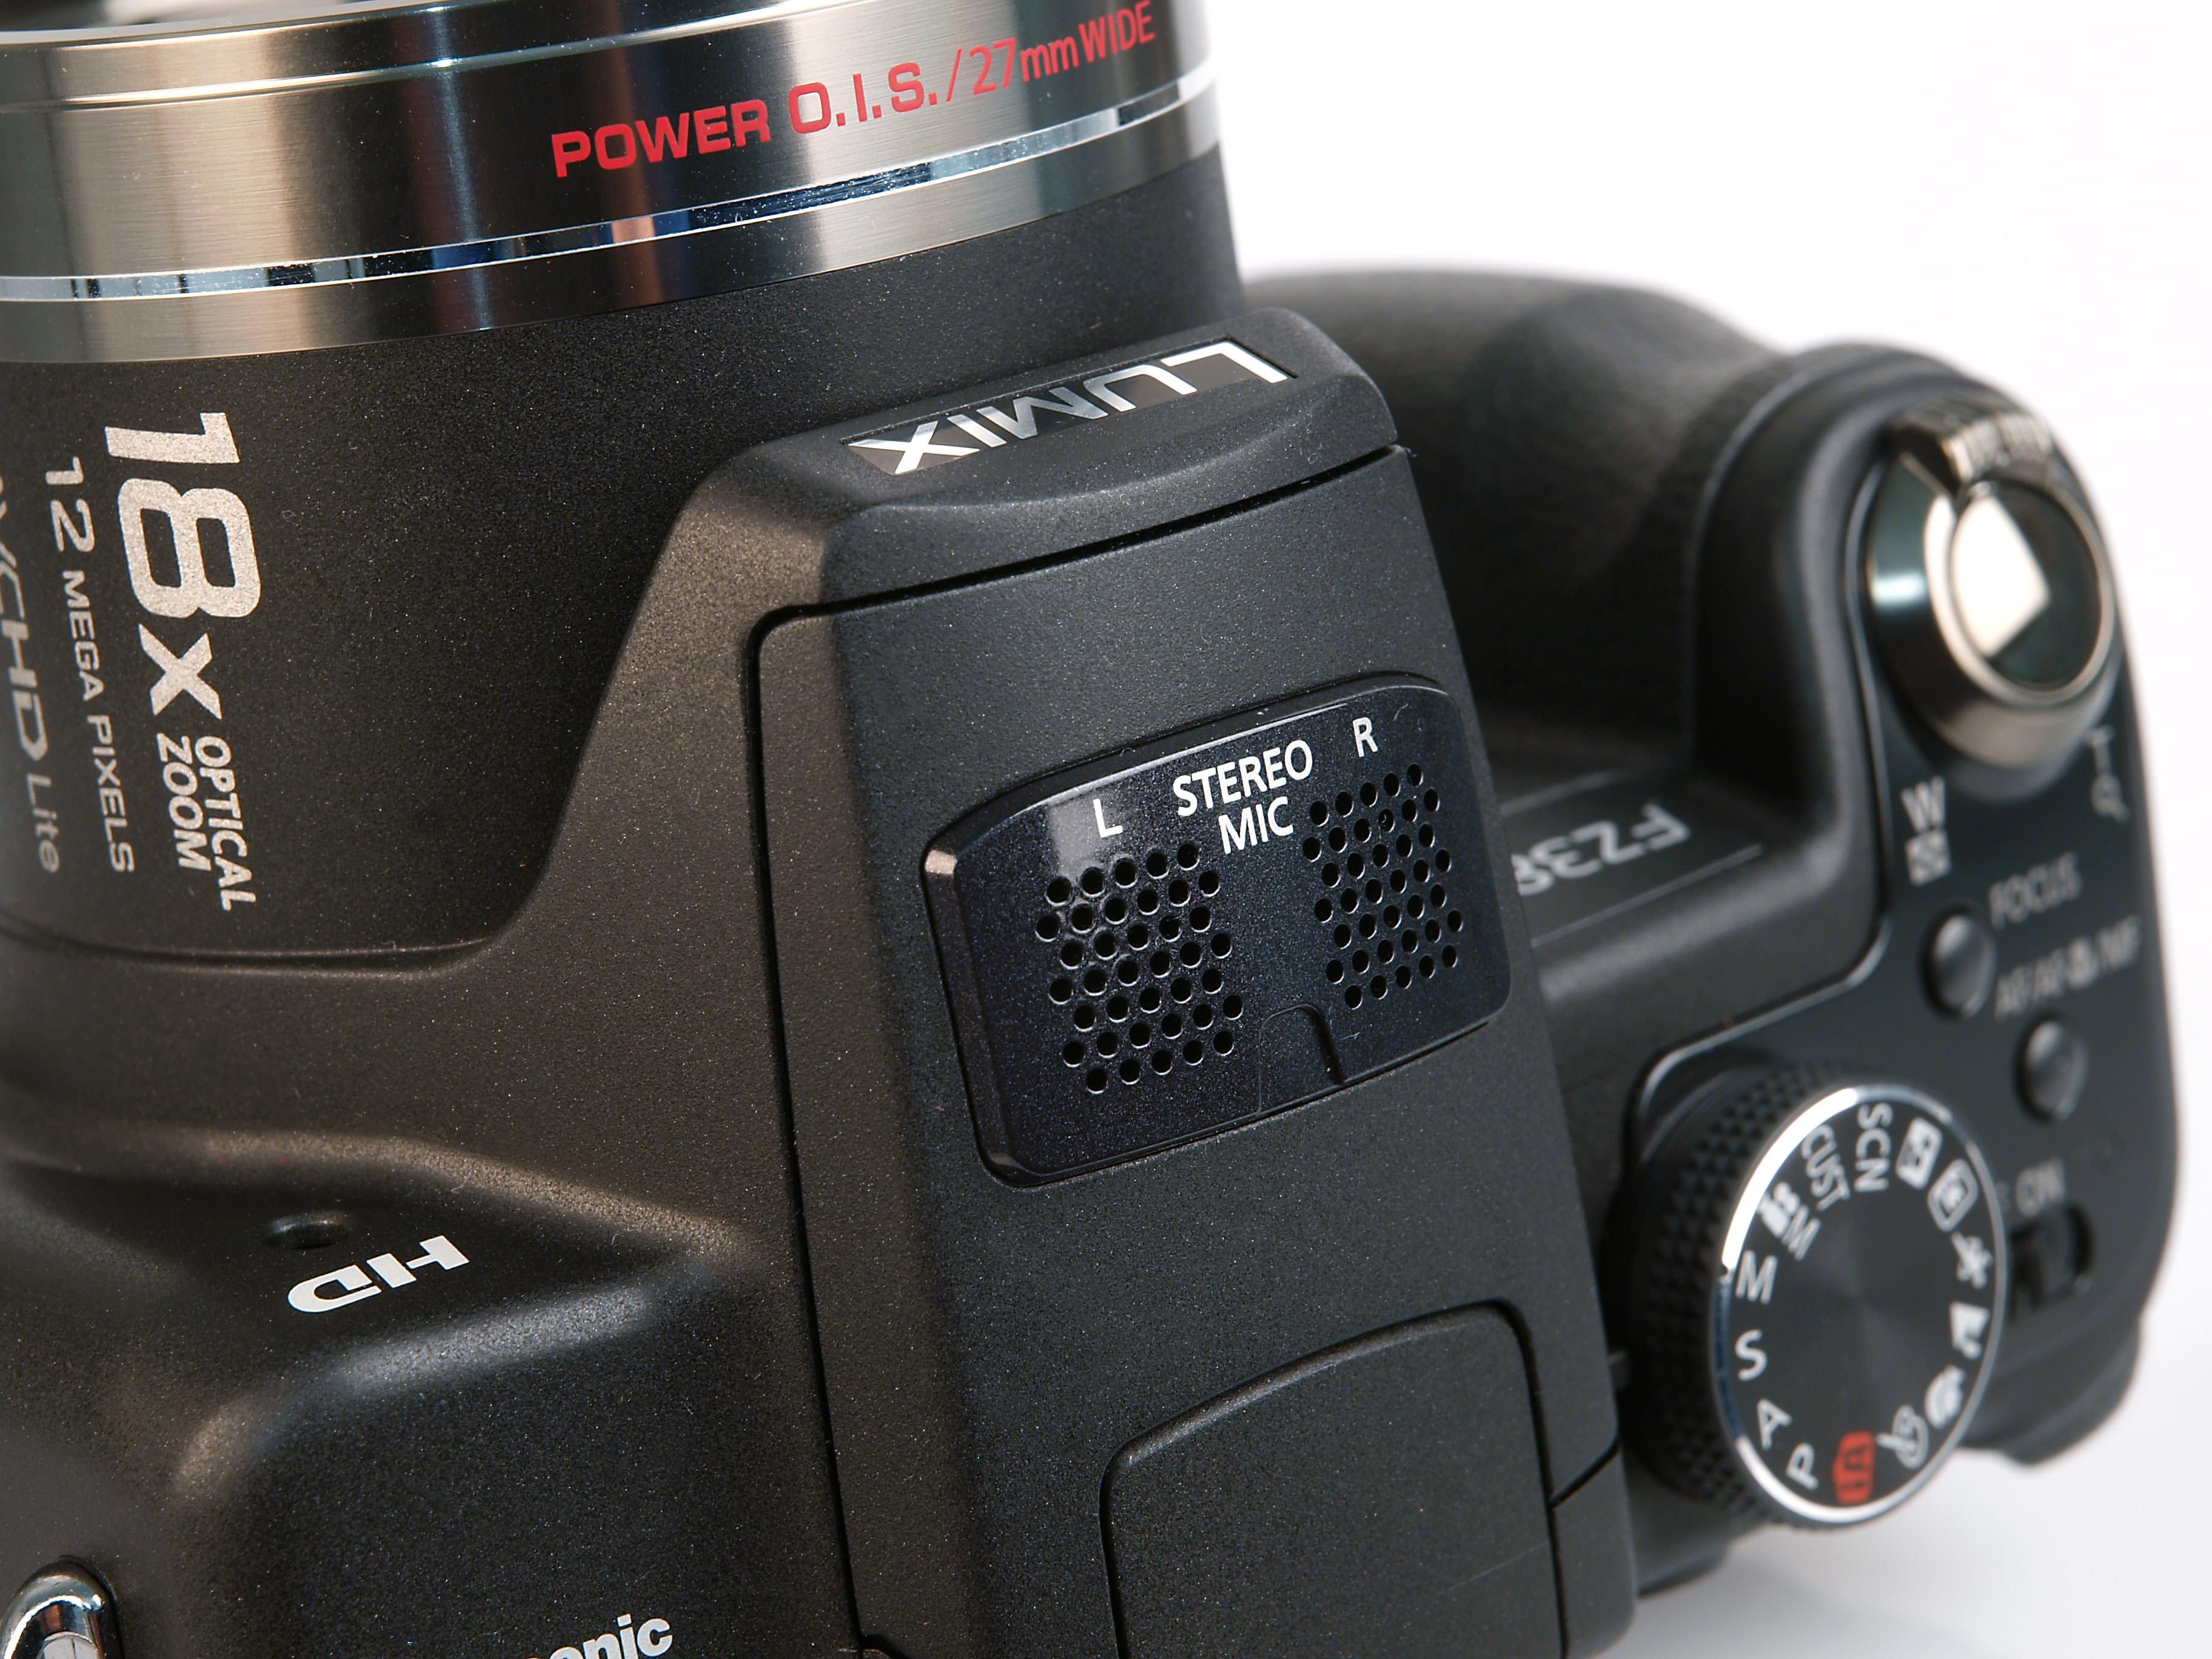 panasonic lumix dmc fz38 first look digital camera review rh ephotozine com 12H802 Manual Tractor Service Manuals